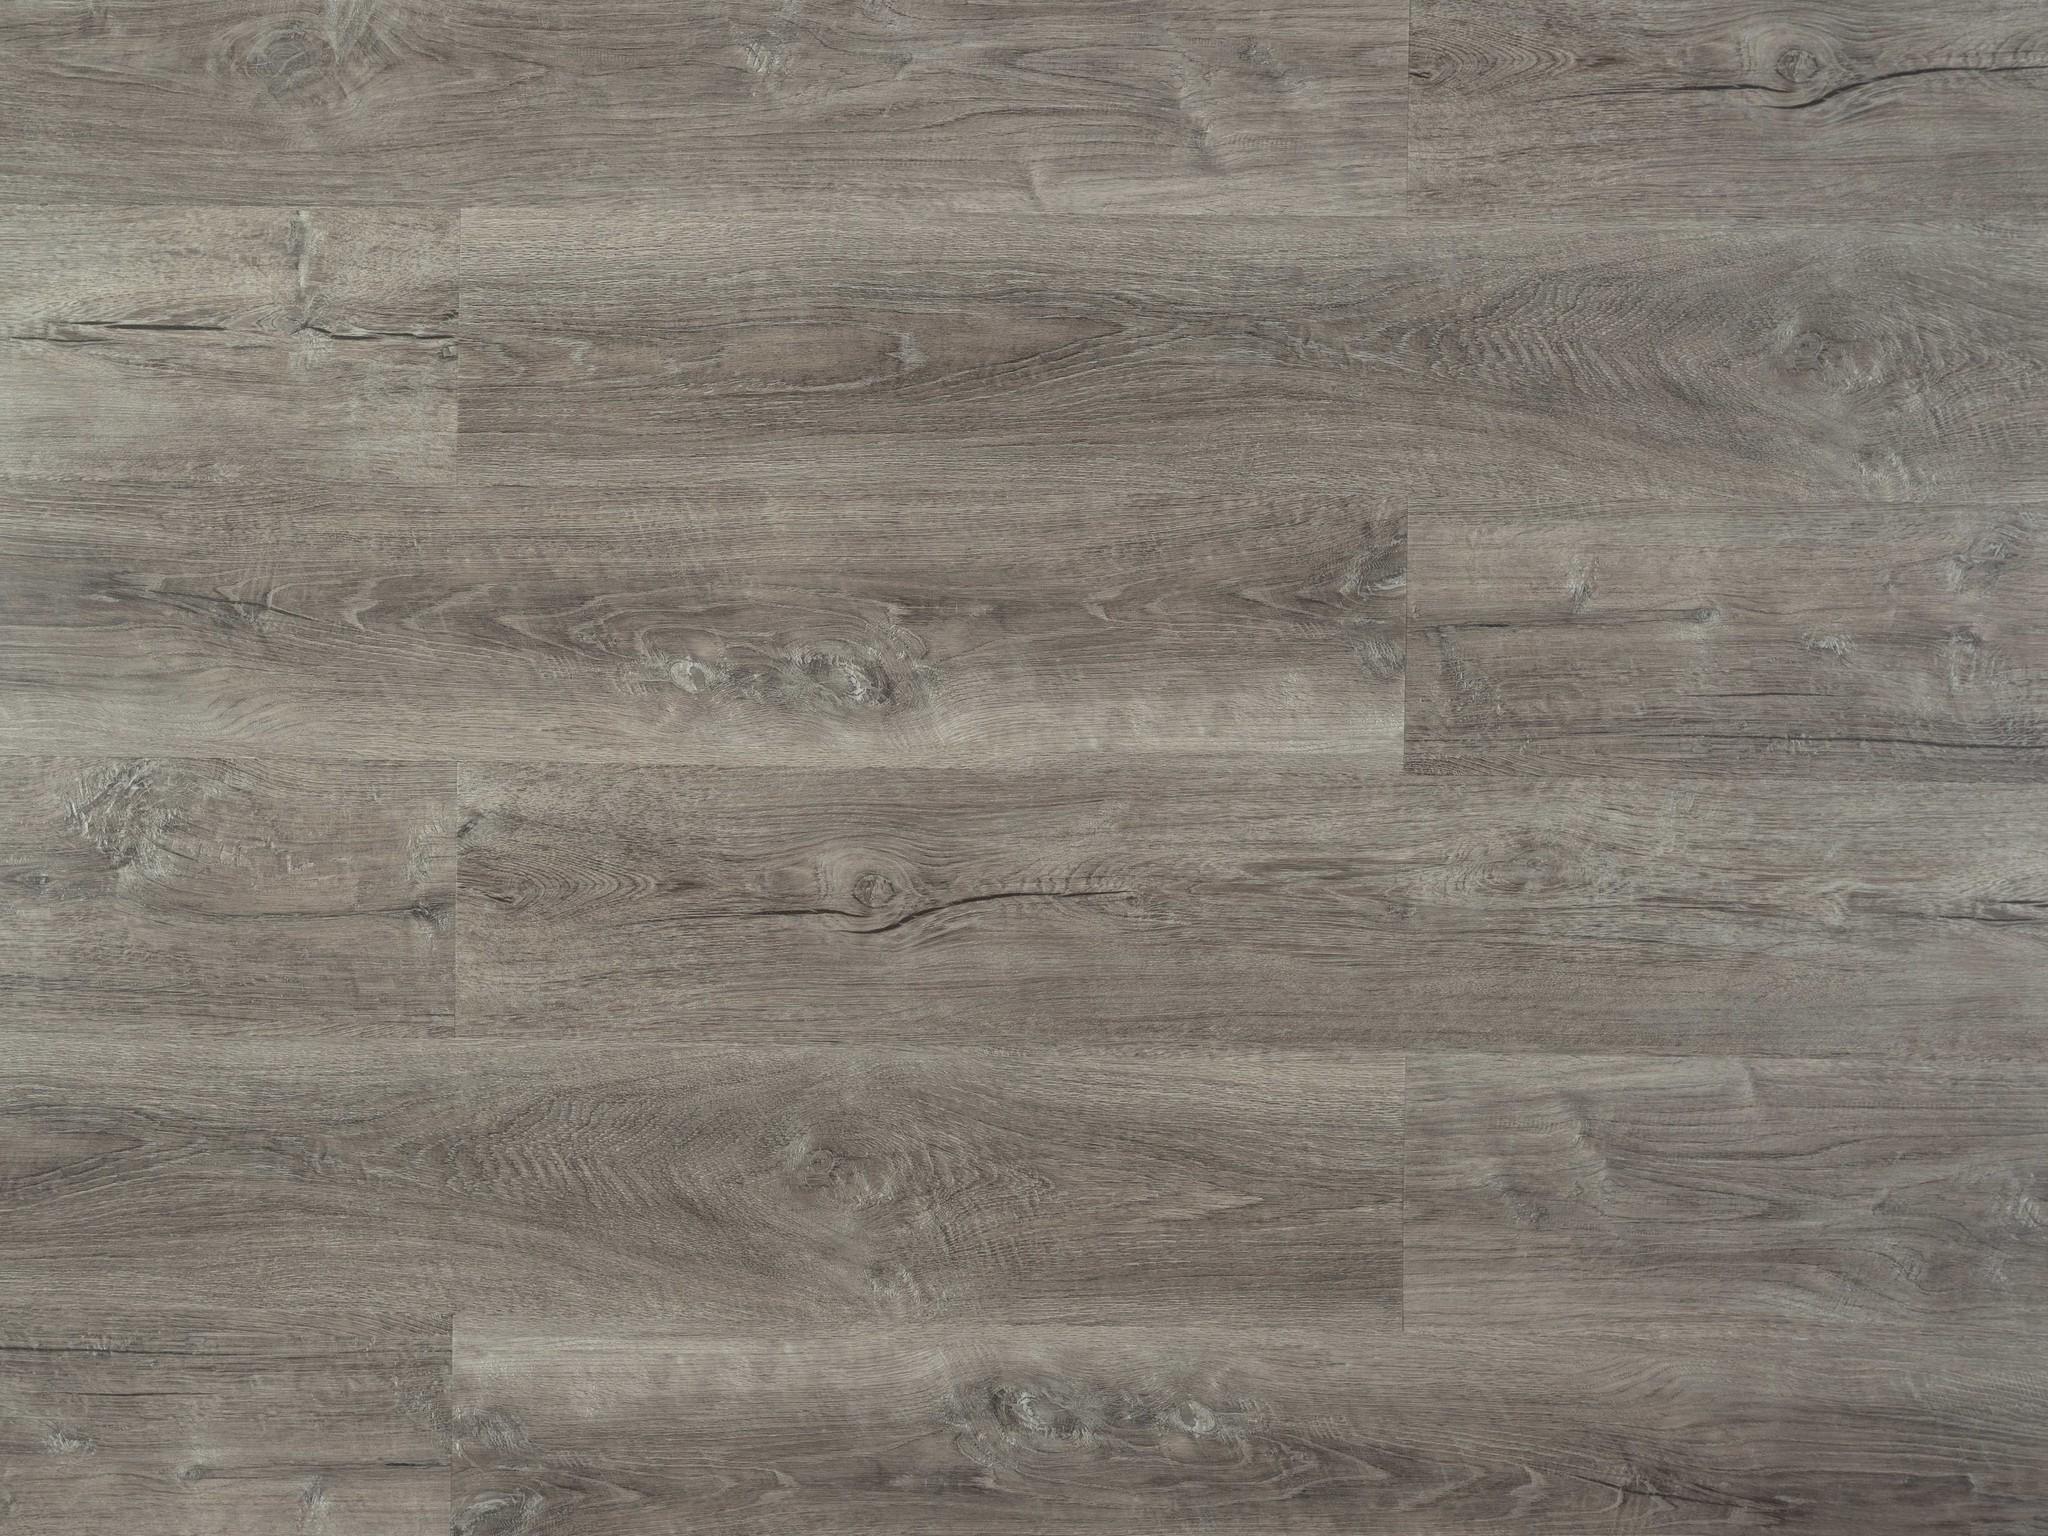 Tajima TRN-6420 Pure scandinavian wood